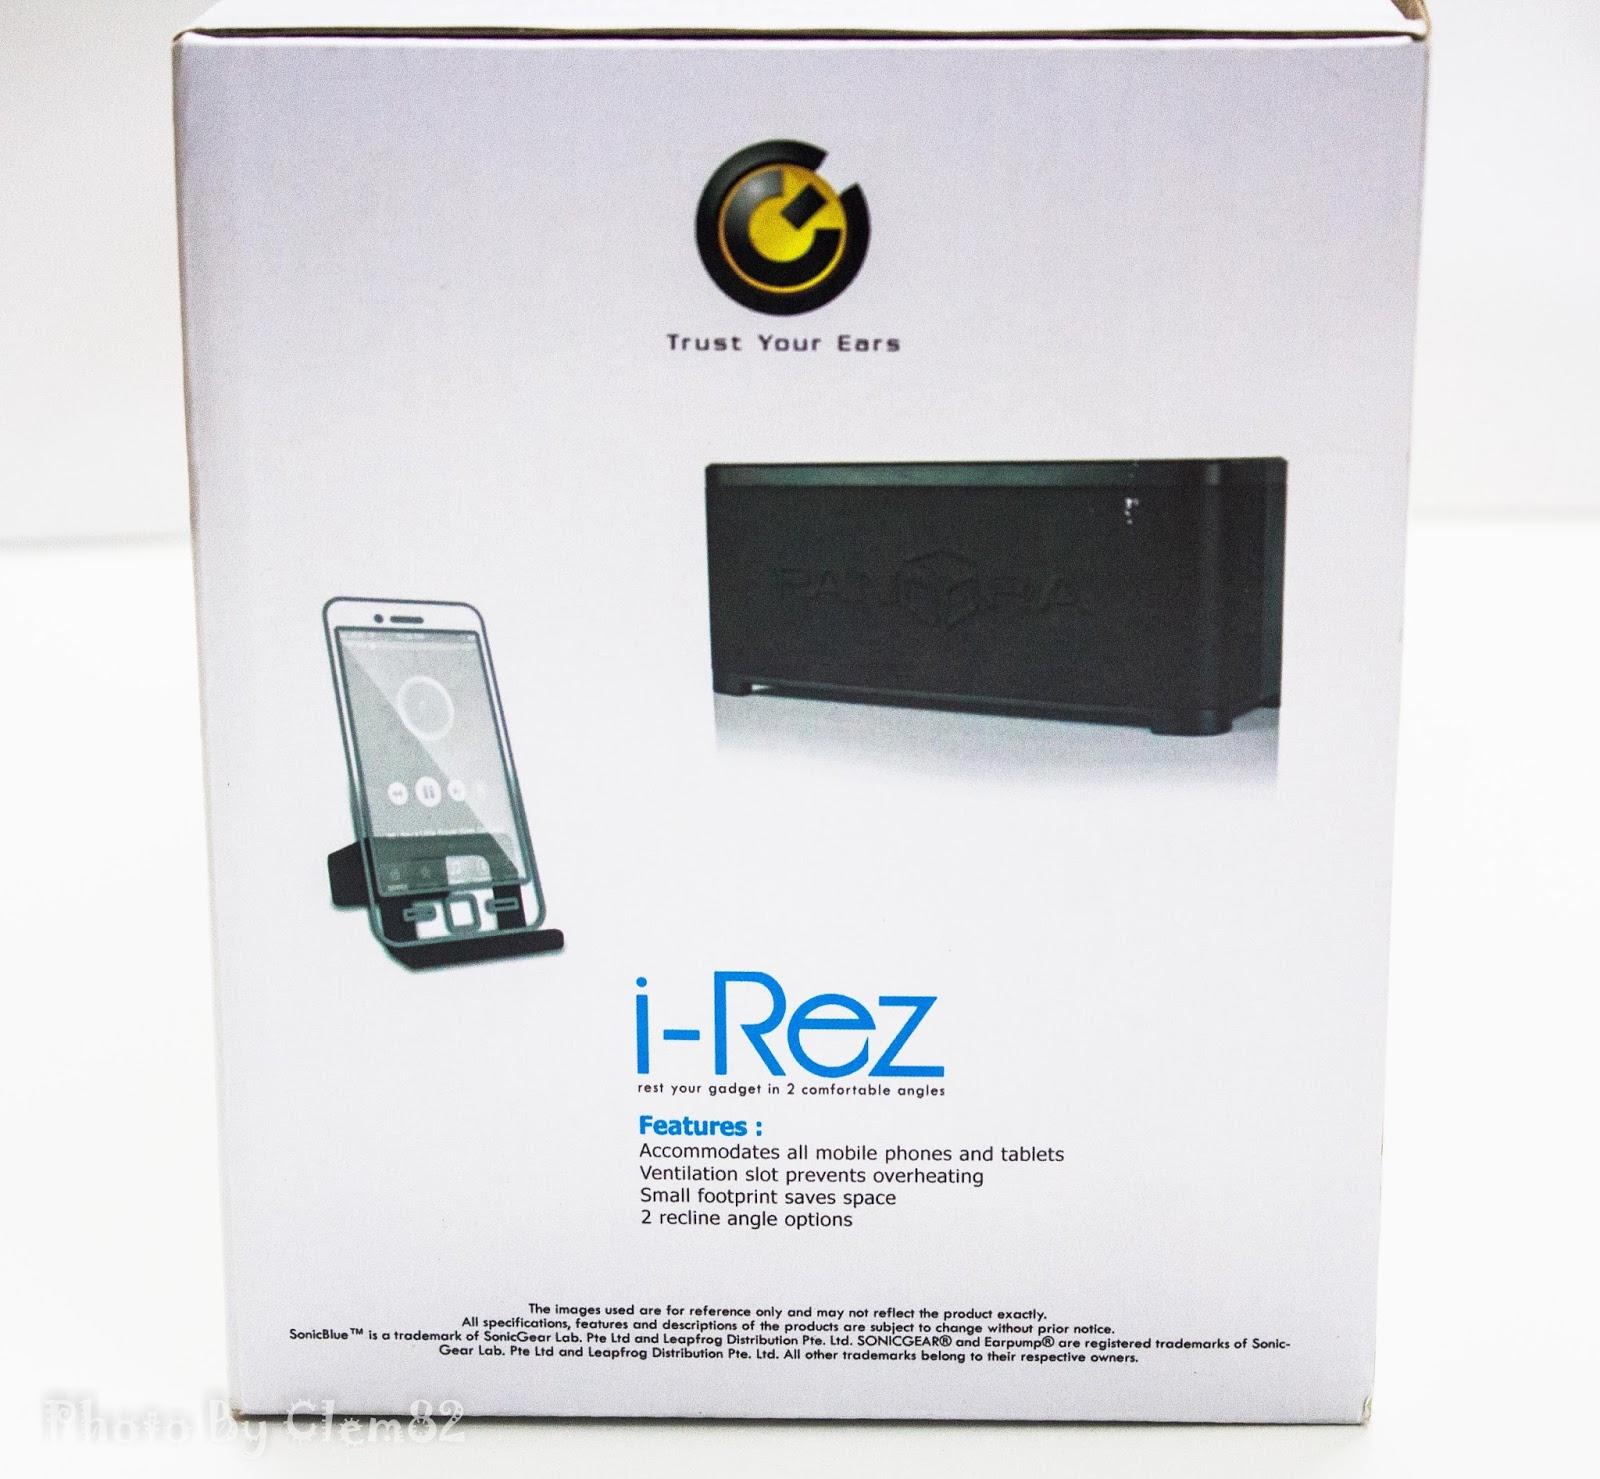 Opening Pandora's Box: SonicGear Pandora Wireless Bluetooth Media Player Series 21